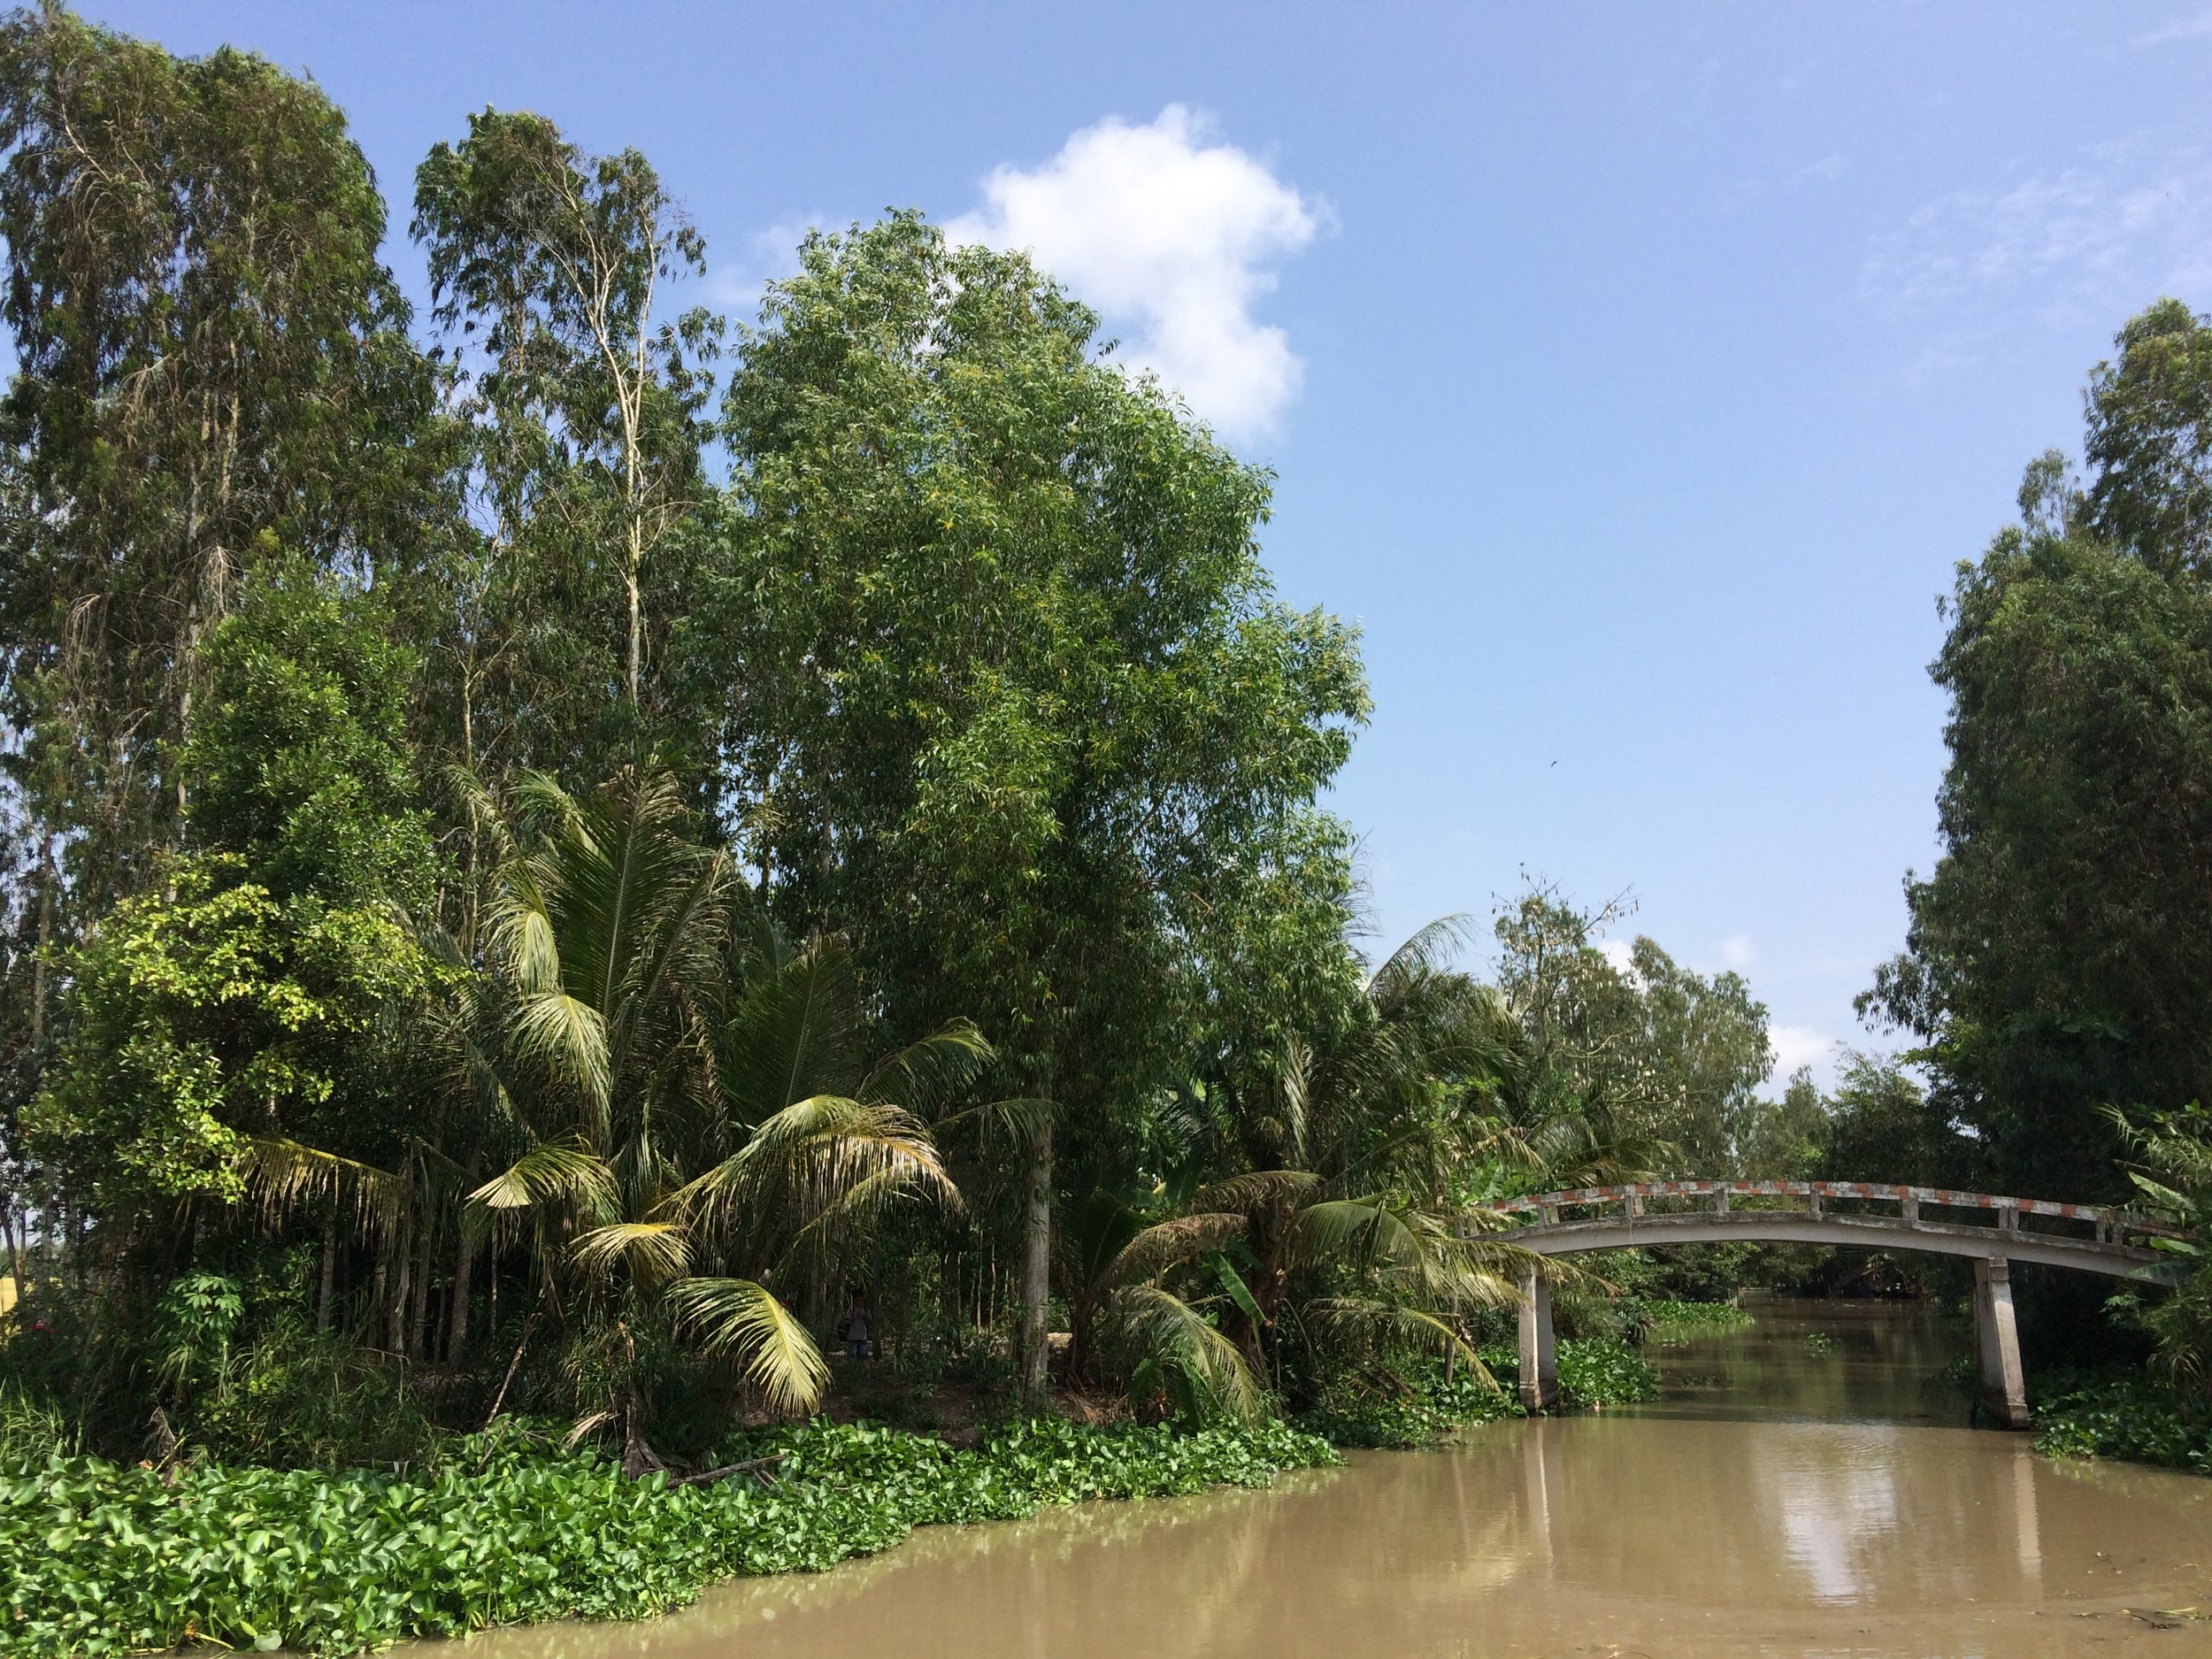 One of the more rider friendly bridges between Trah Vinh and Soc Trang